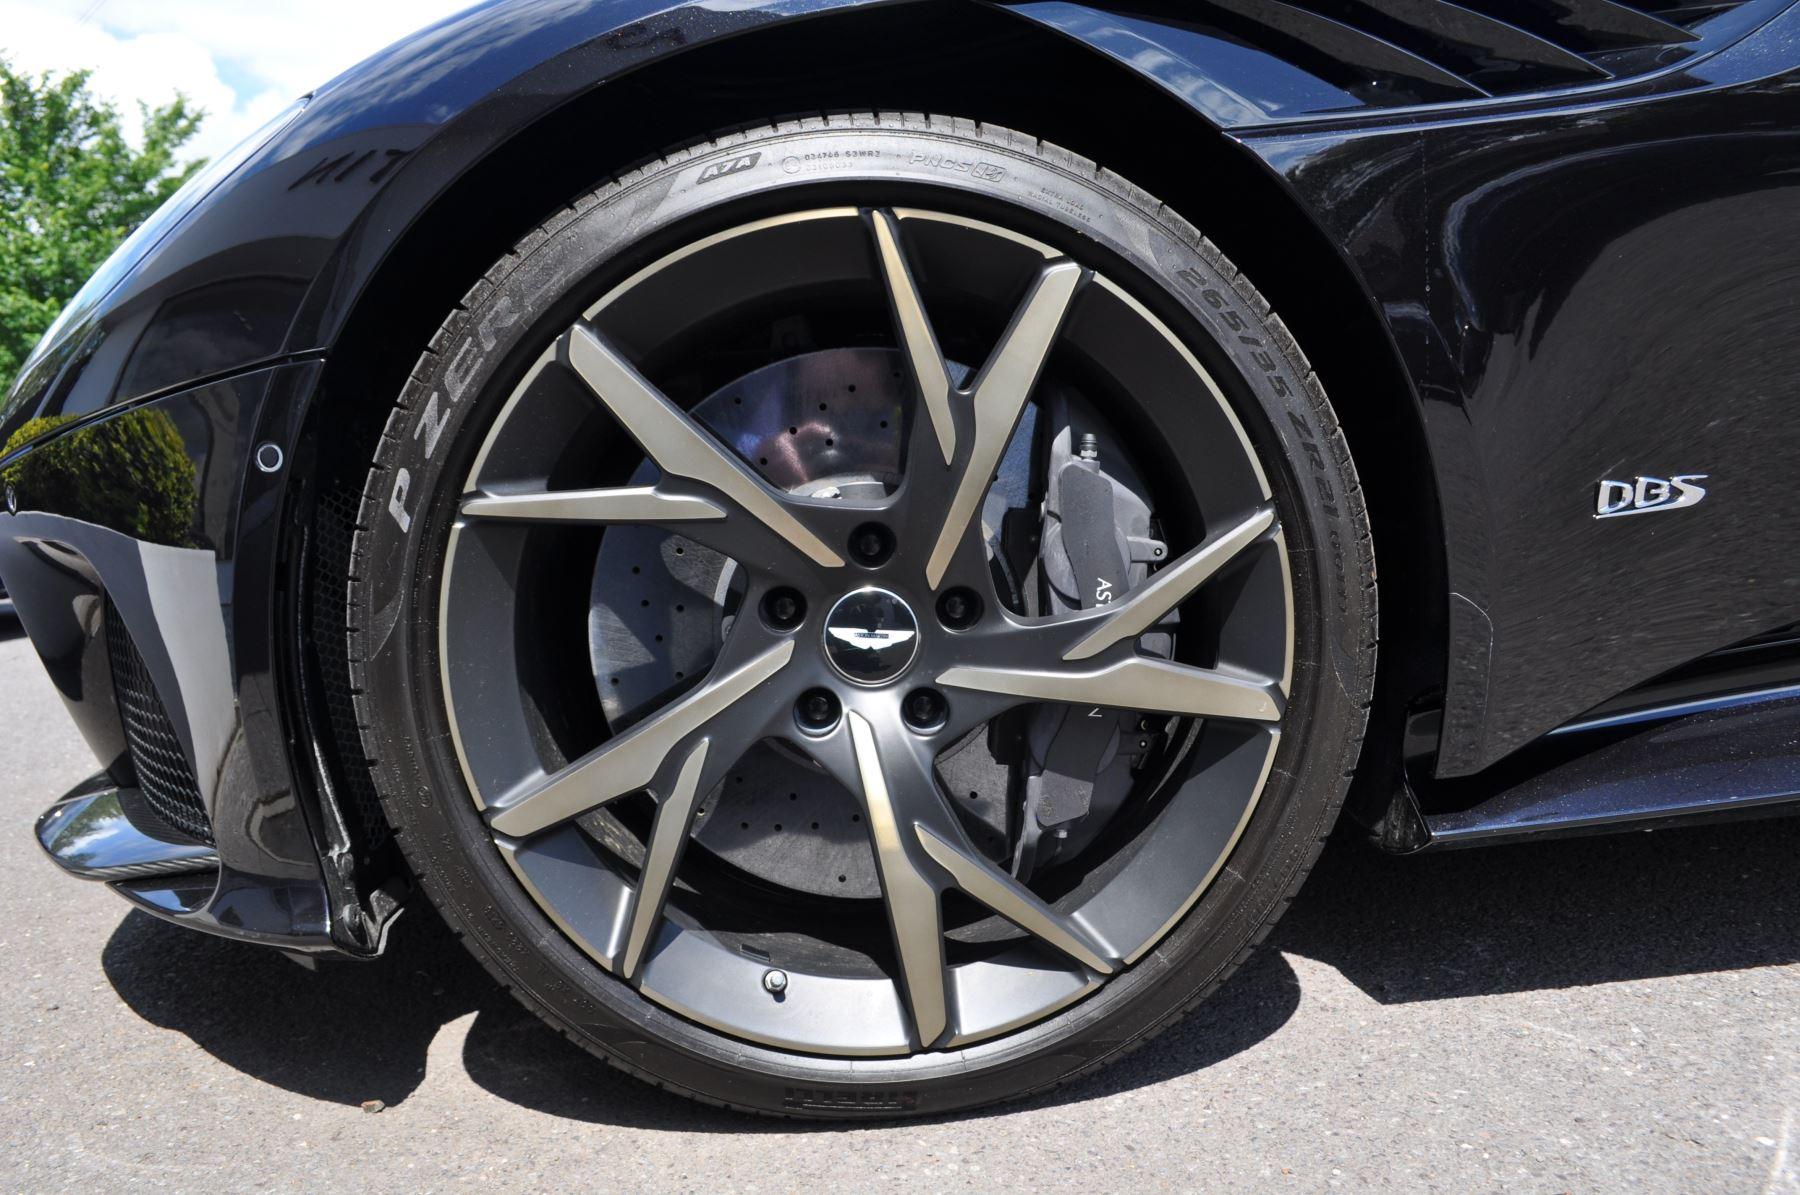 Aston Martin DBS V12 Superleggera Touchtronic image 19